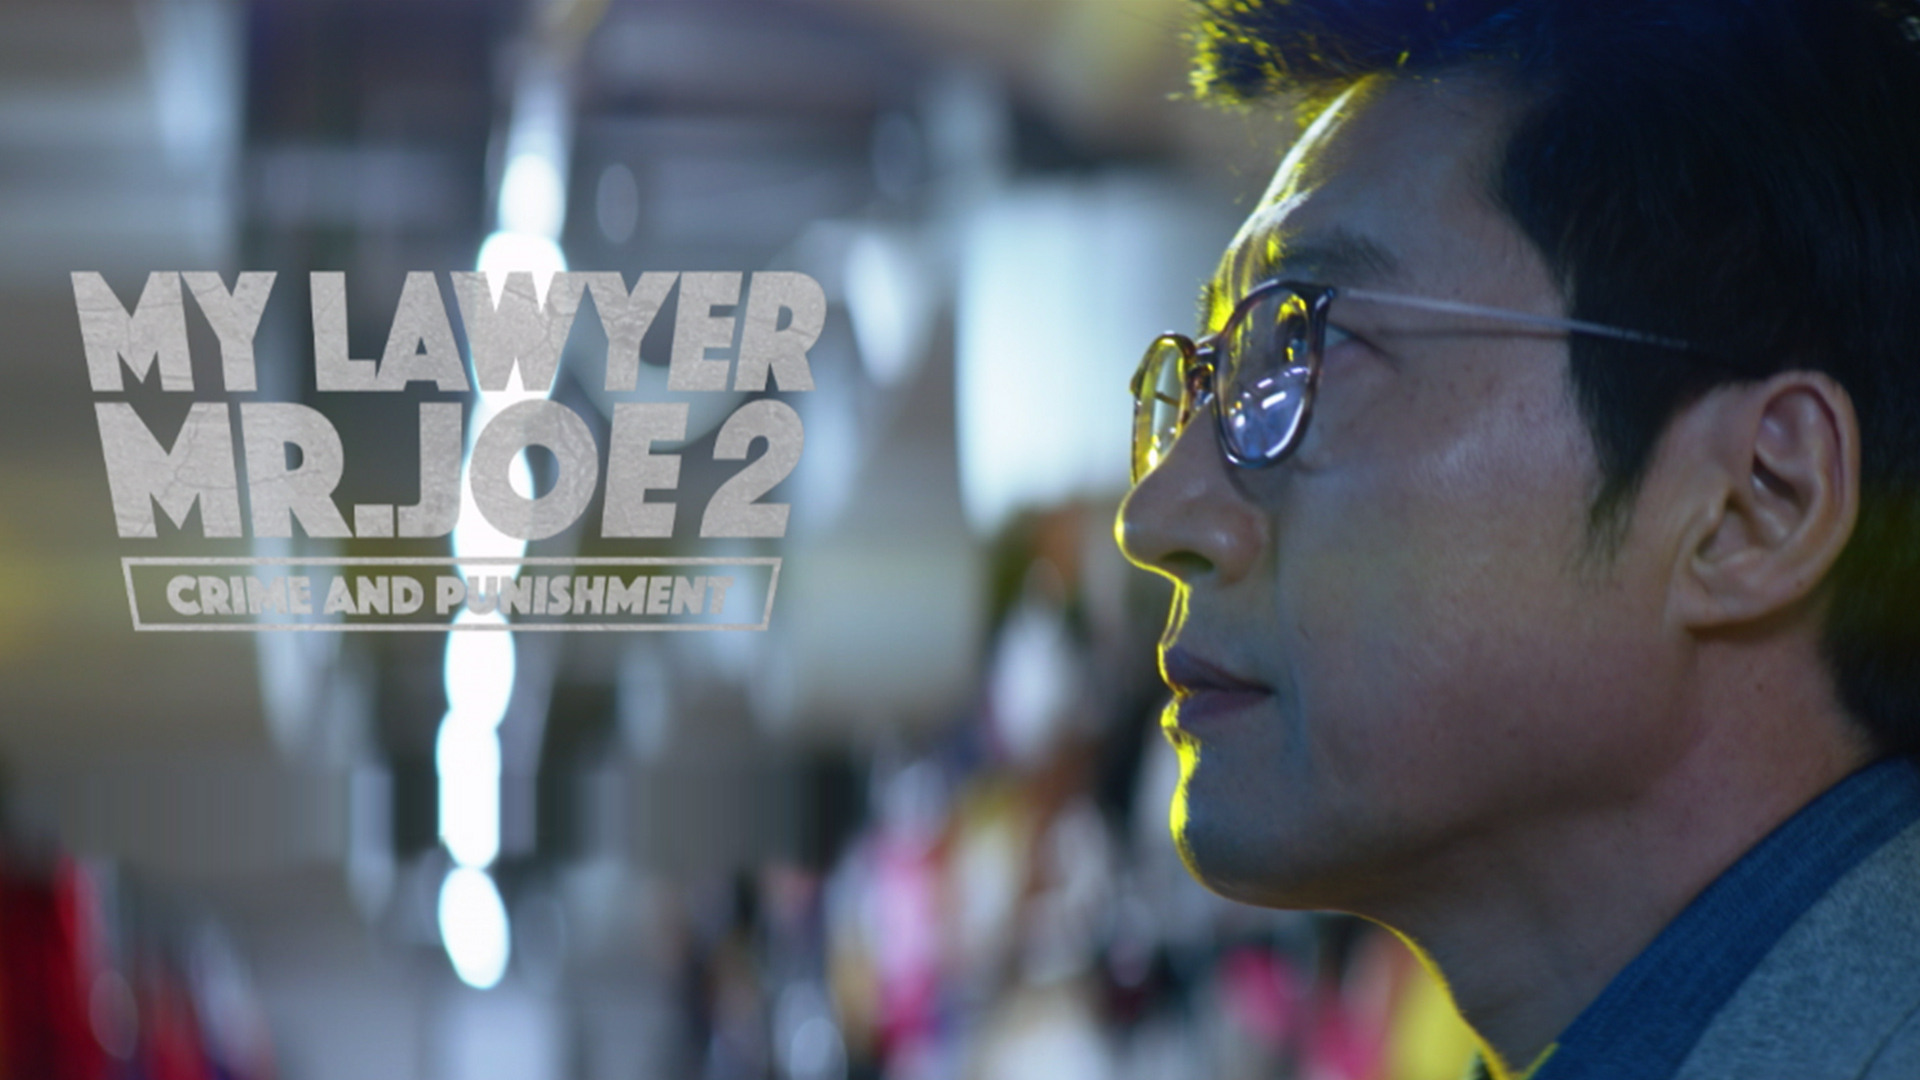 MY LAWYER, MR. JOE 2 : CRIME AND PUNISHMENT